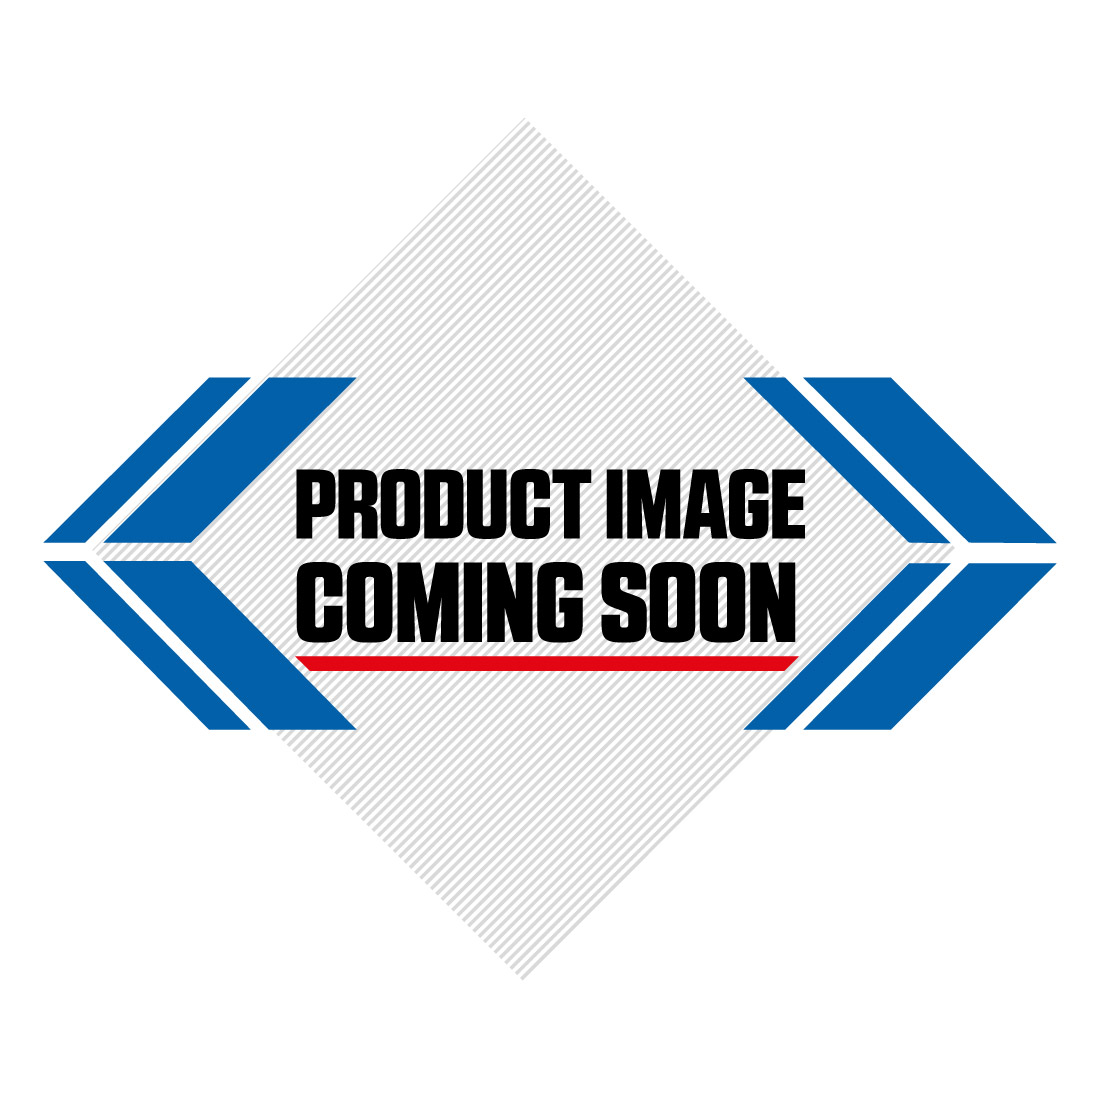 DJI Mavic Pro Fly More Combo 4K Quadcopter Drone Image-5